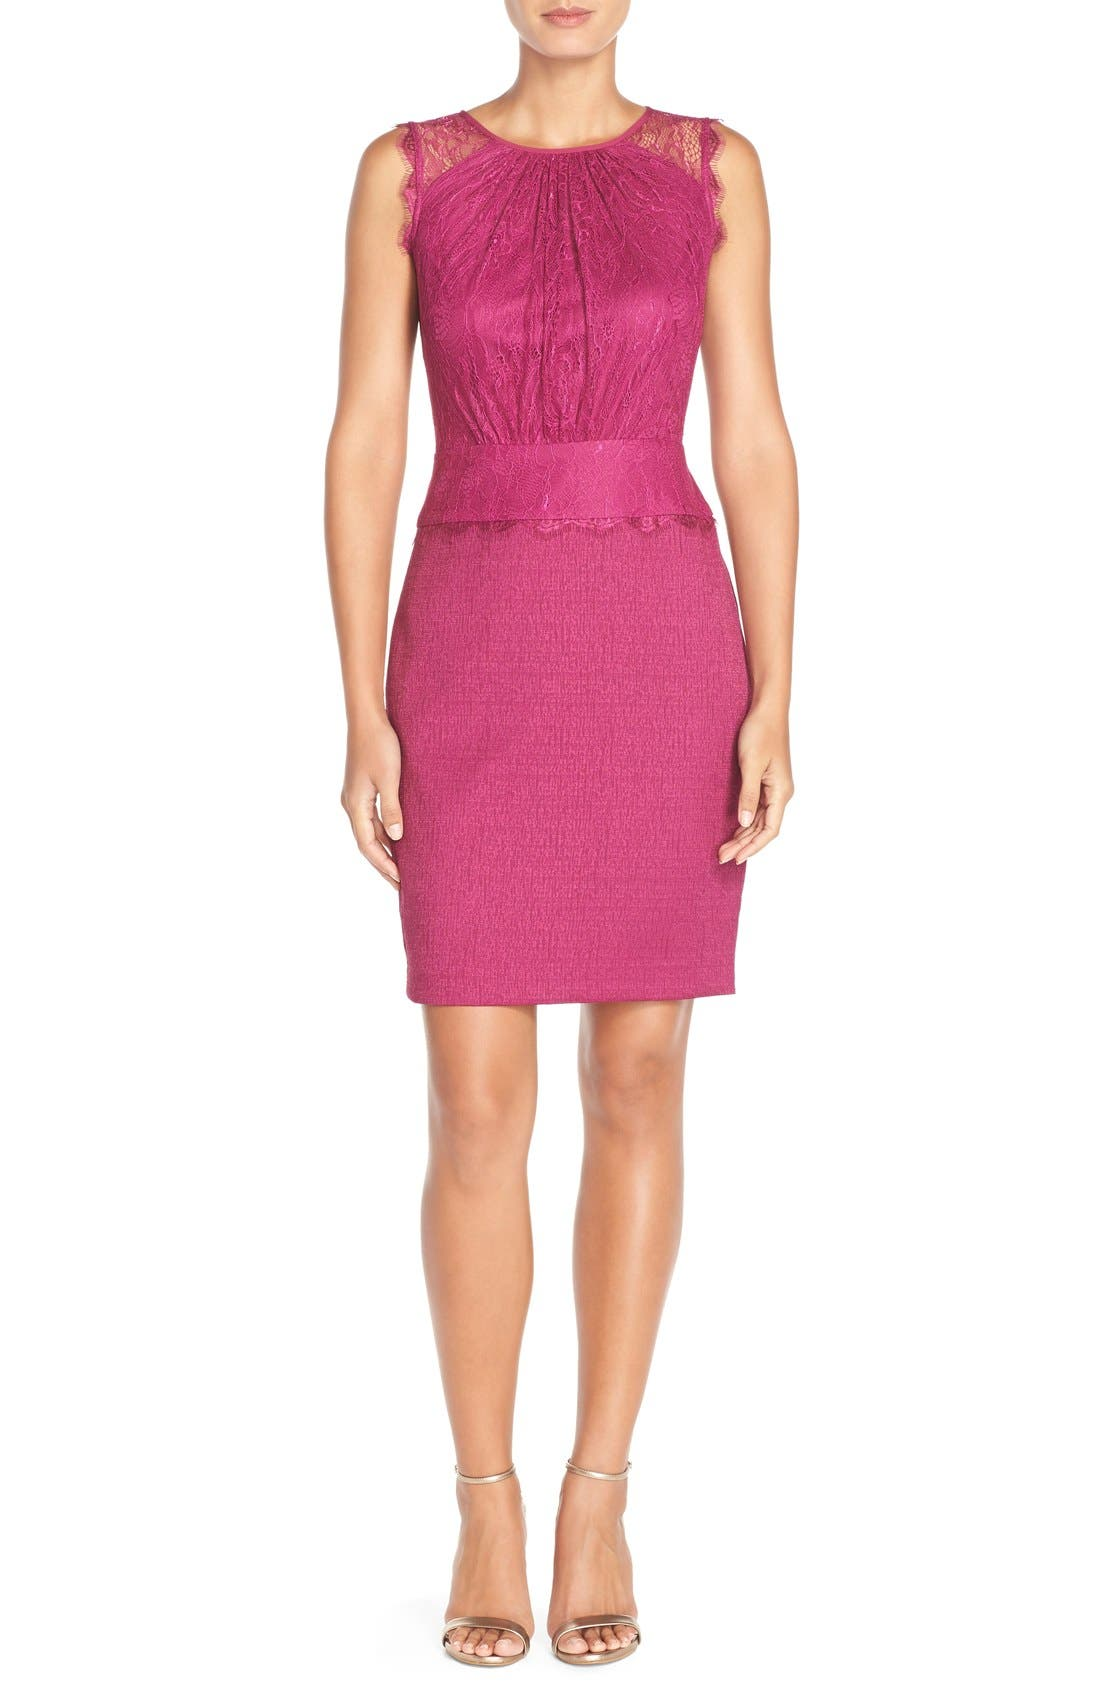 Alternate Image 1 Selected - Adrianna Papell Lace & Jacquard Blouson Dress (Regular & Petite)